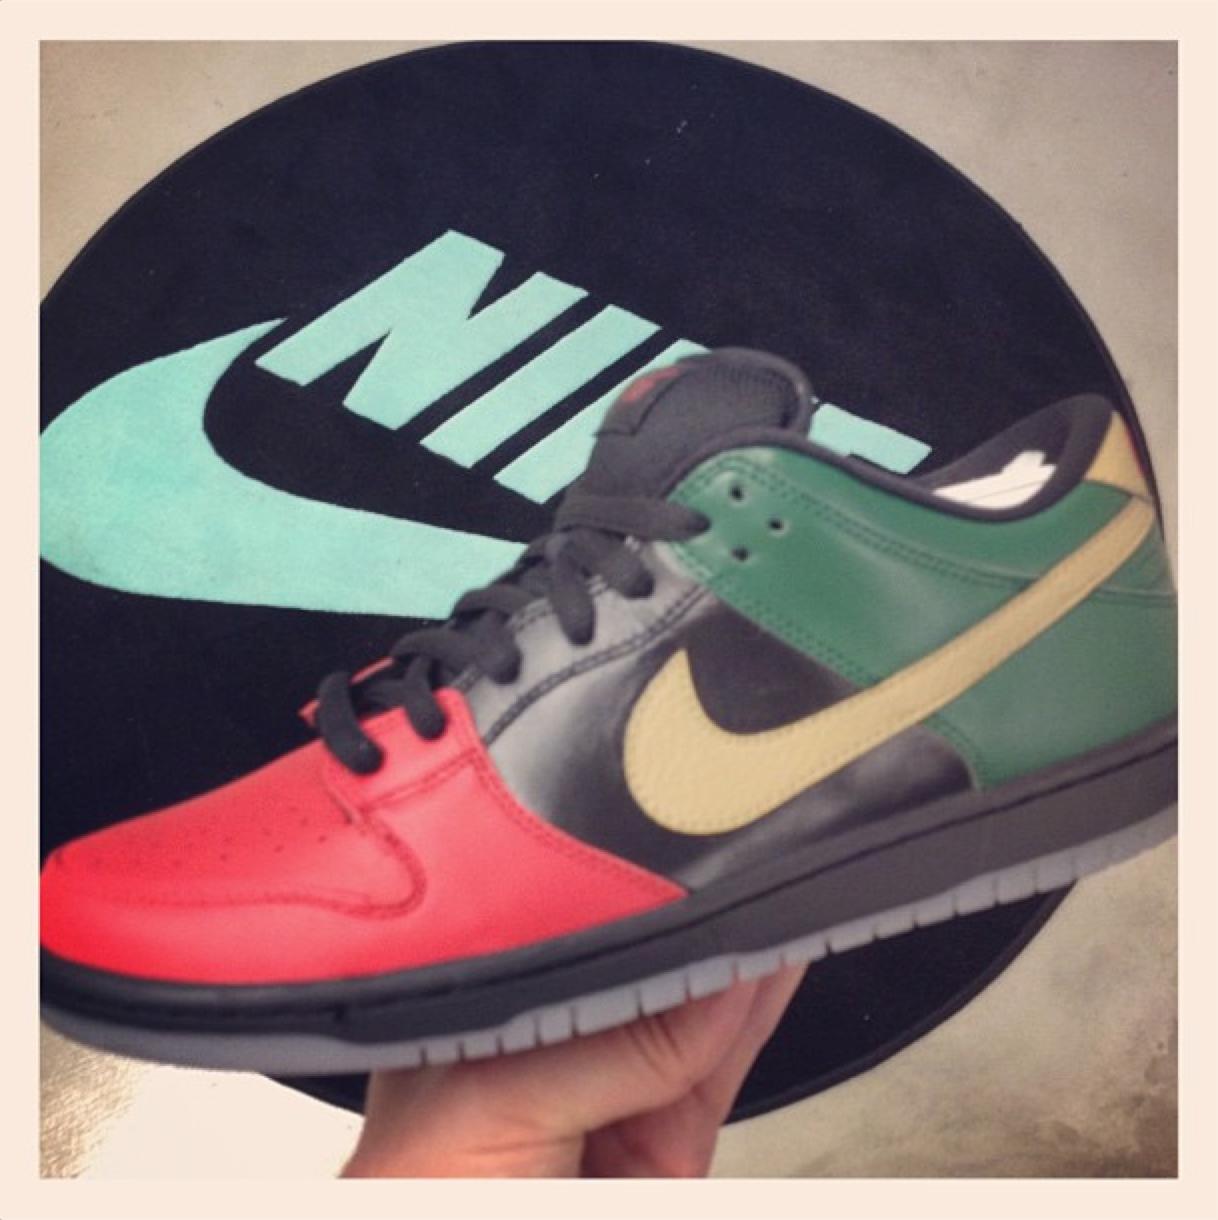 Nike SB Dunk Low 'Black History Month' - February 2013